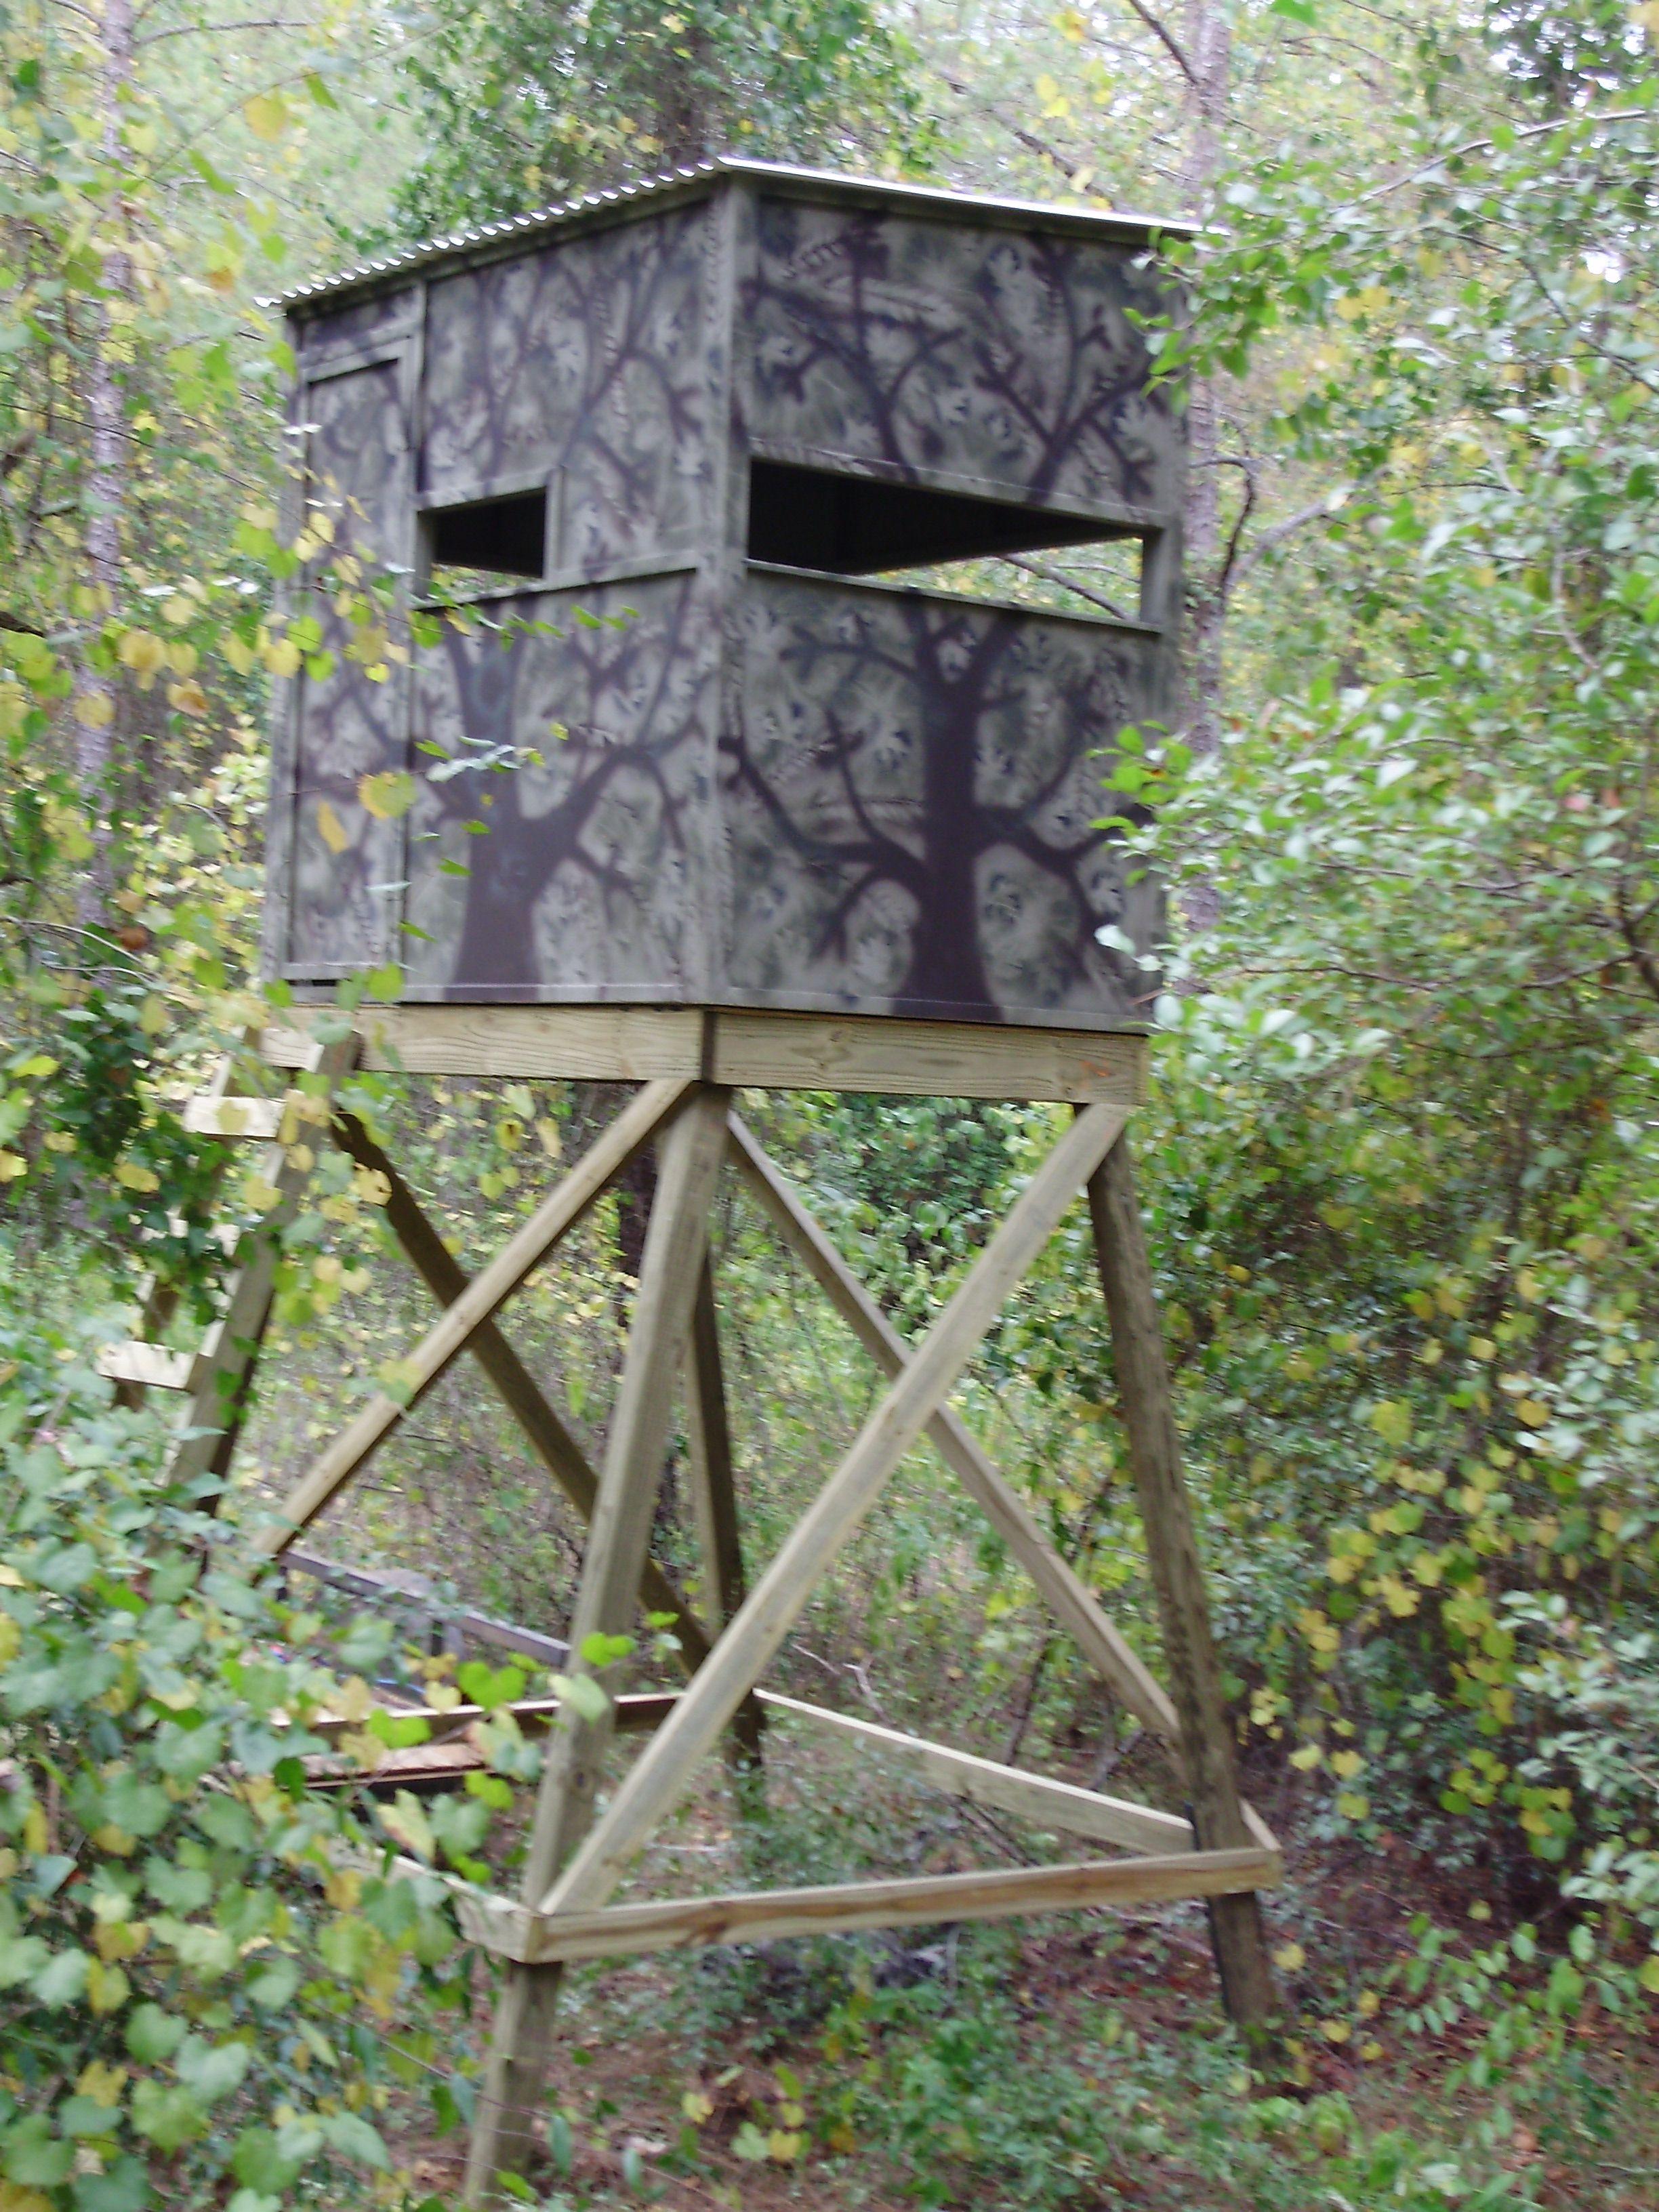 Wood Deer Stands Plans Free Download Wistful29gsg